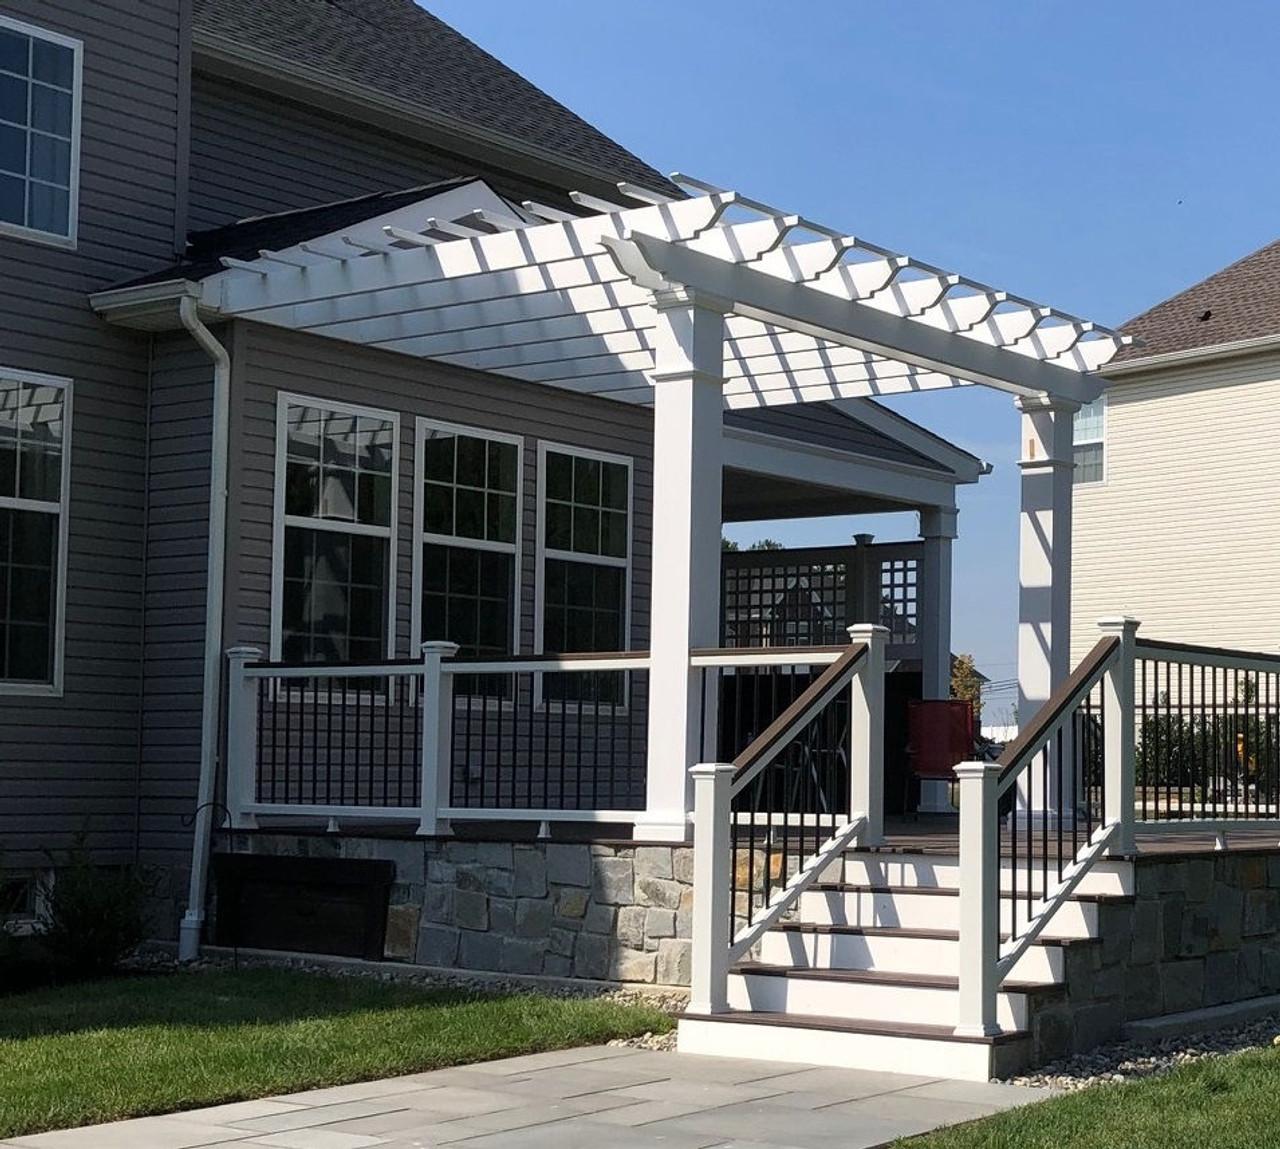 15x13 Structural Fiberglass Wall Mounted Pergola Kit, Robbinsville, New Jersey